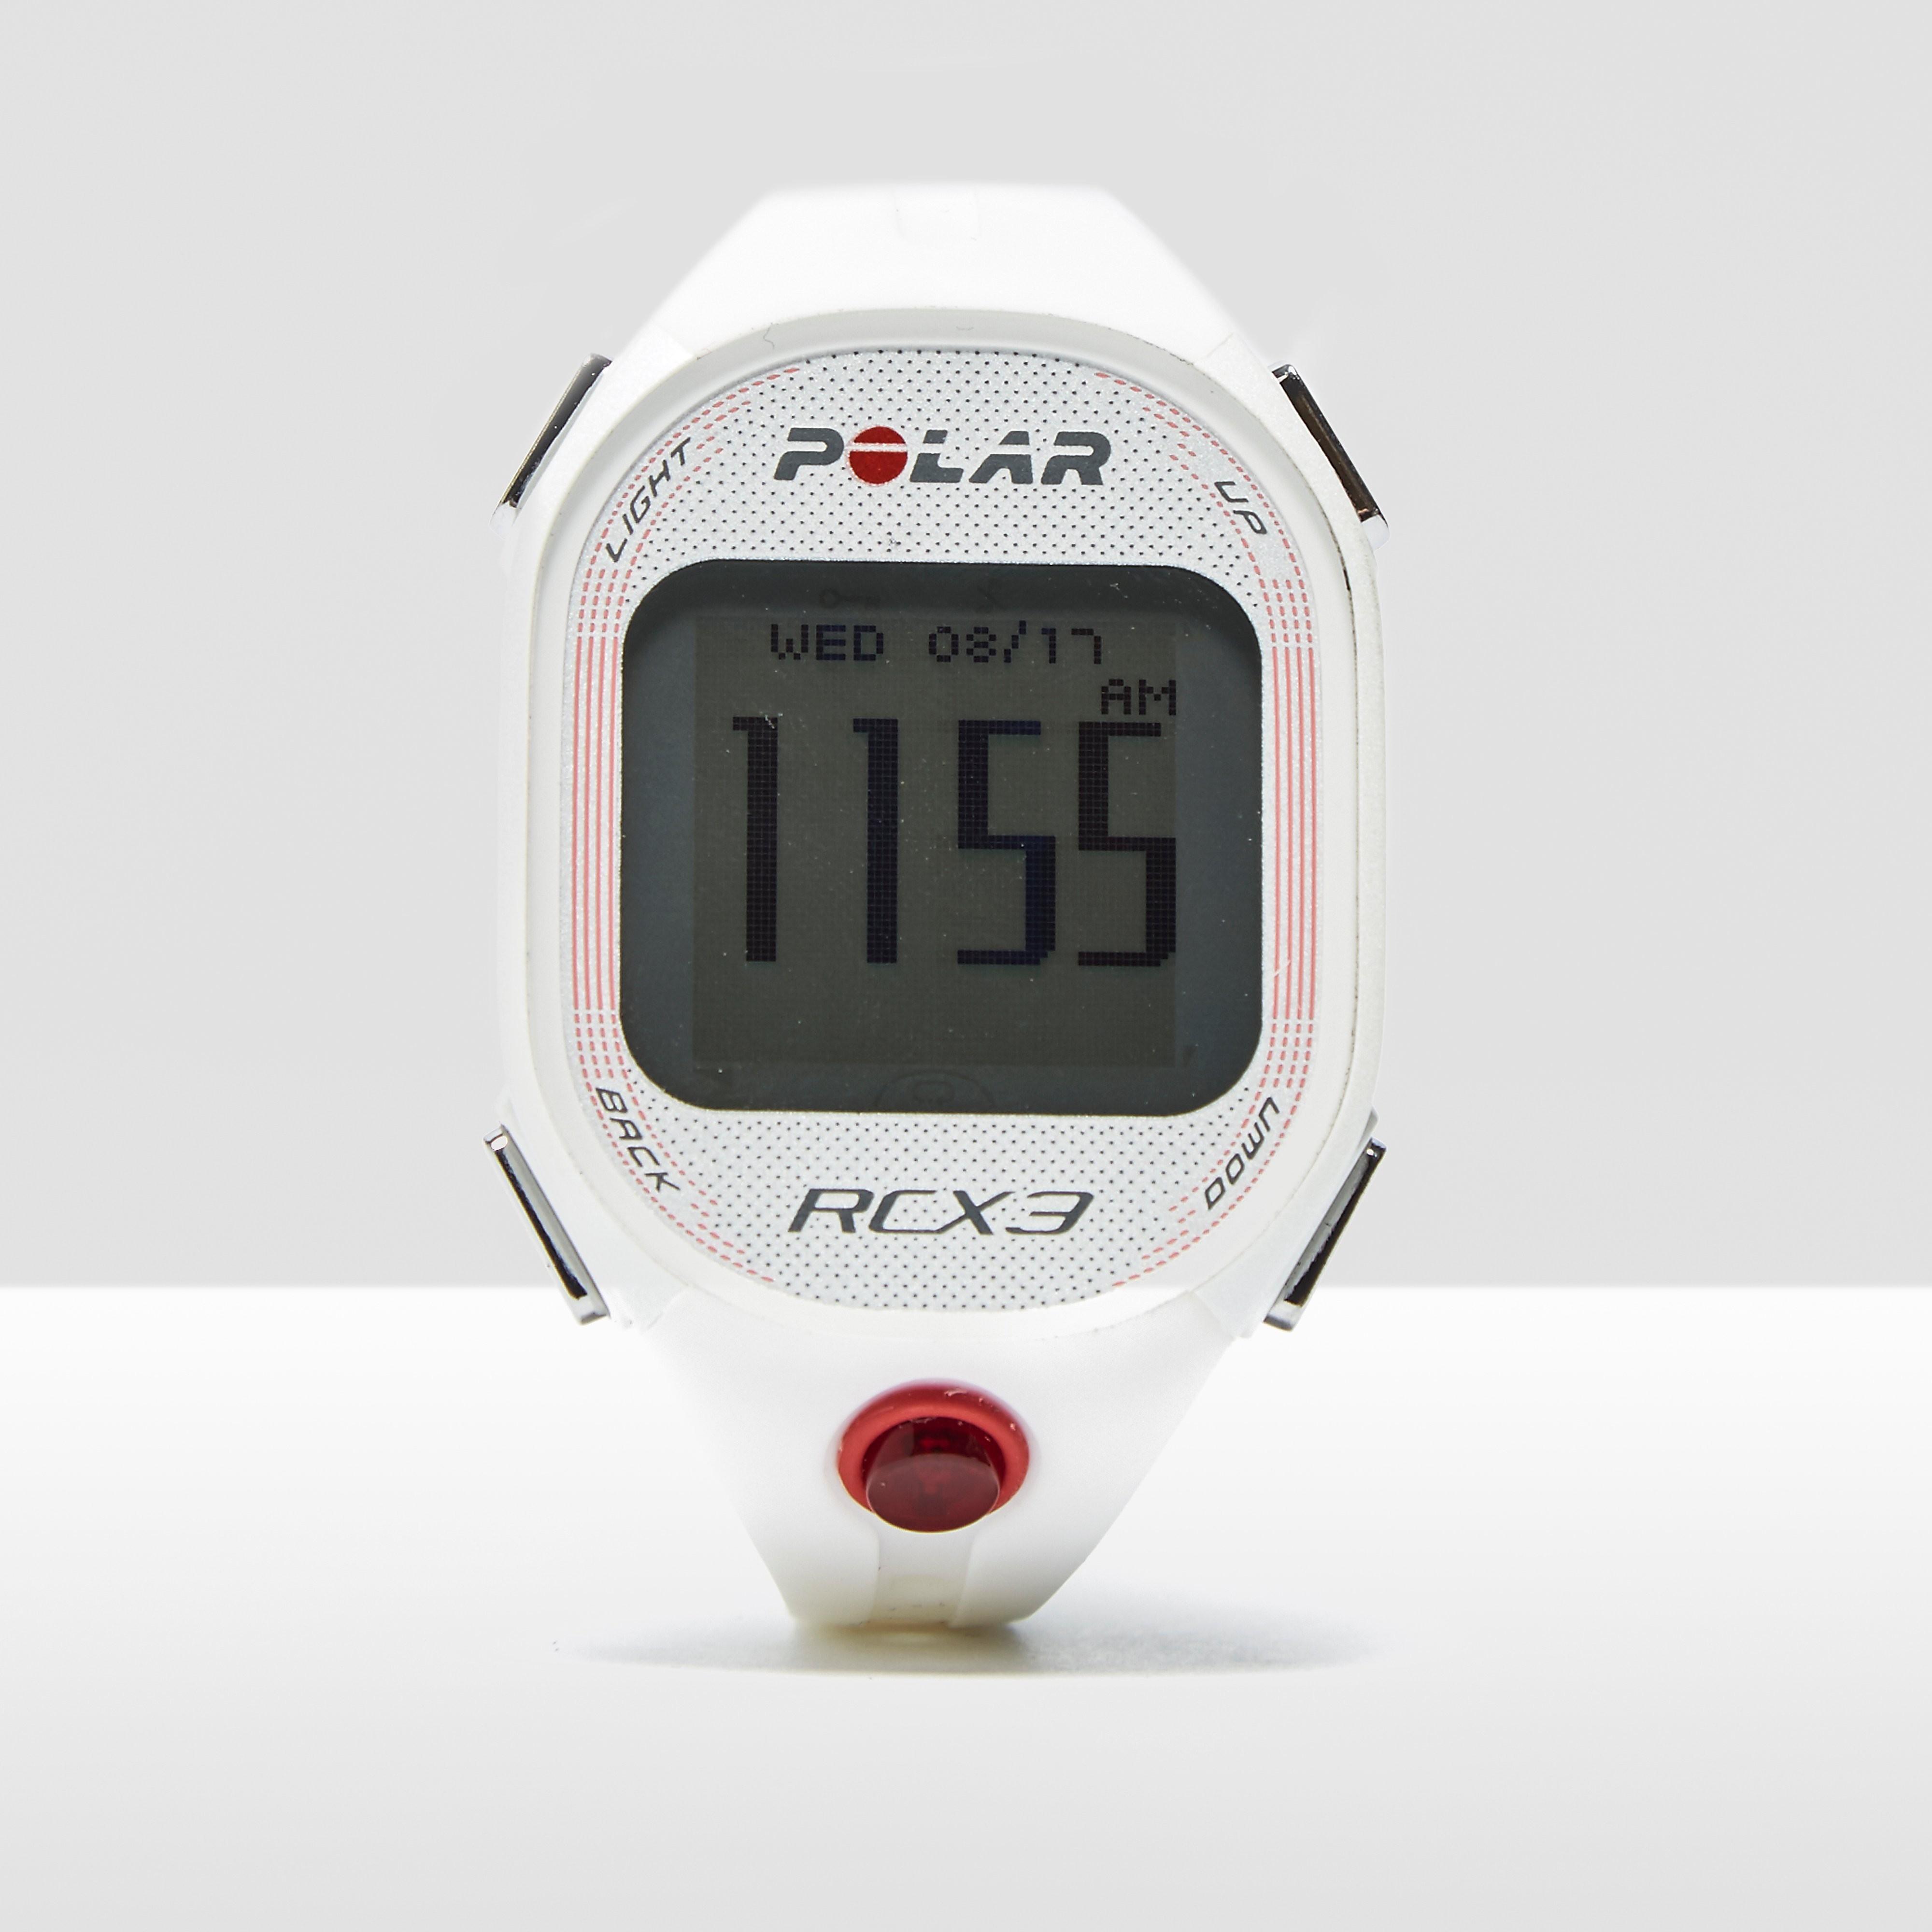 POLAR RCX3 GPS Heart Rate Monitor